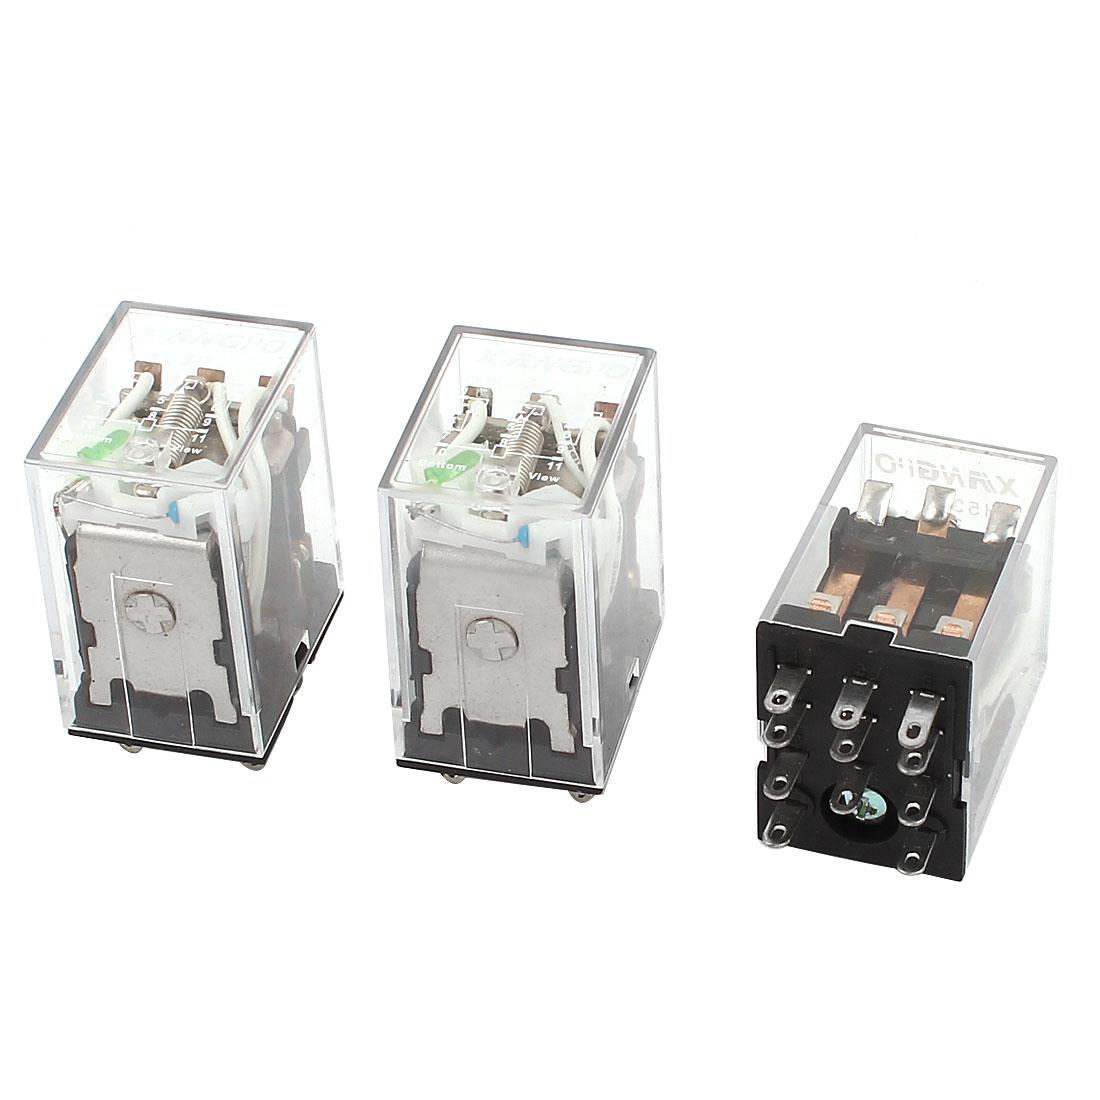 HH53PL 11Pins 3PDT DC 24V Coil Voltage Green LED Pilot Lamp Power Relay 3 Pieces